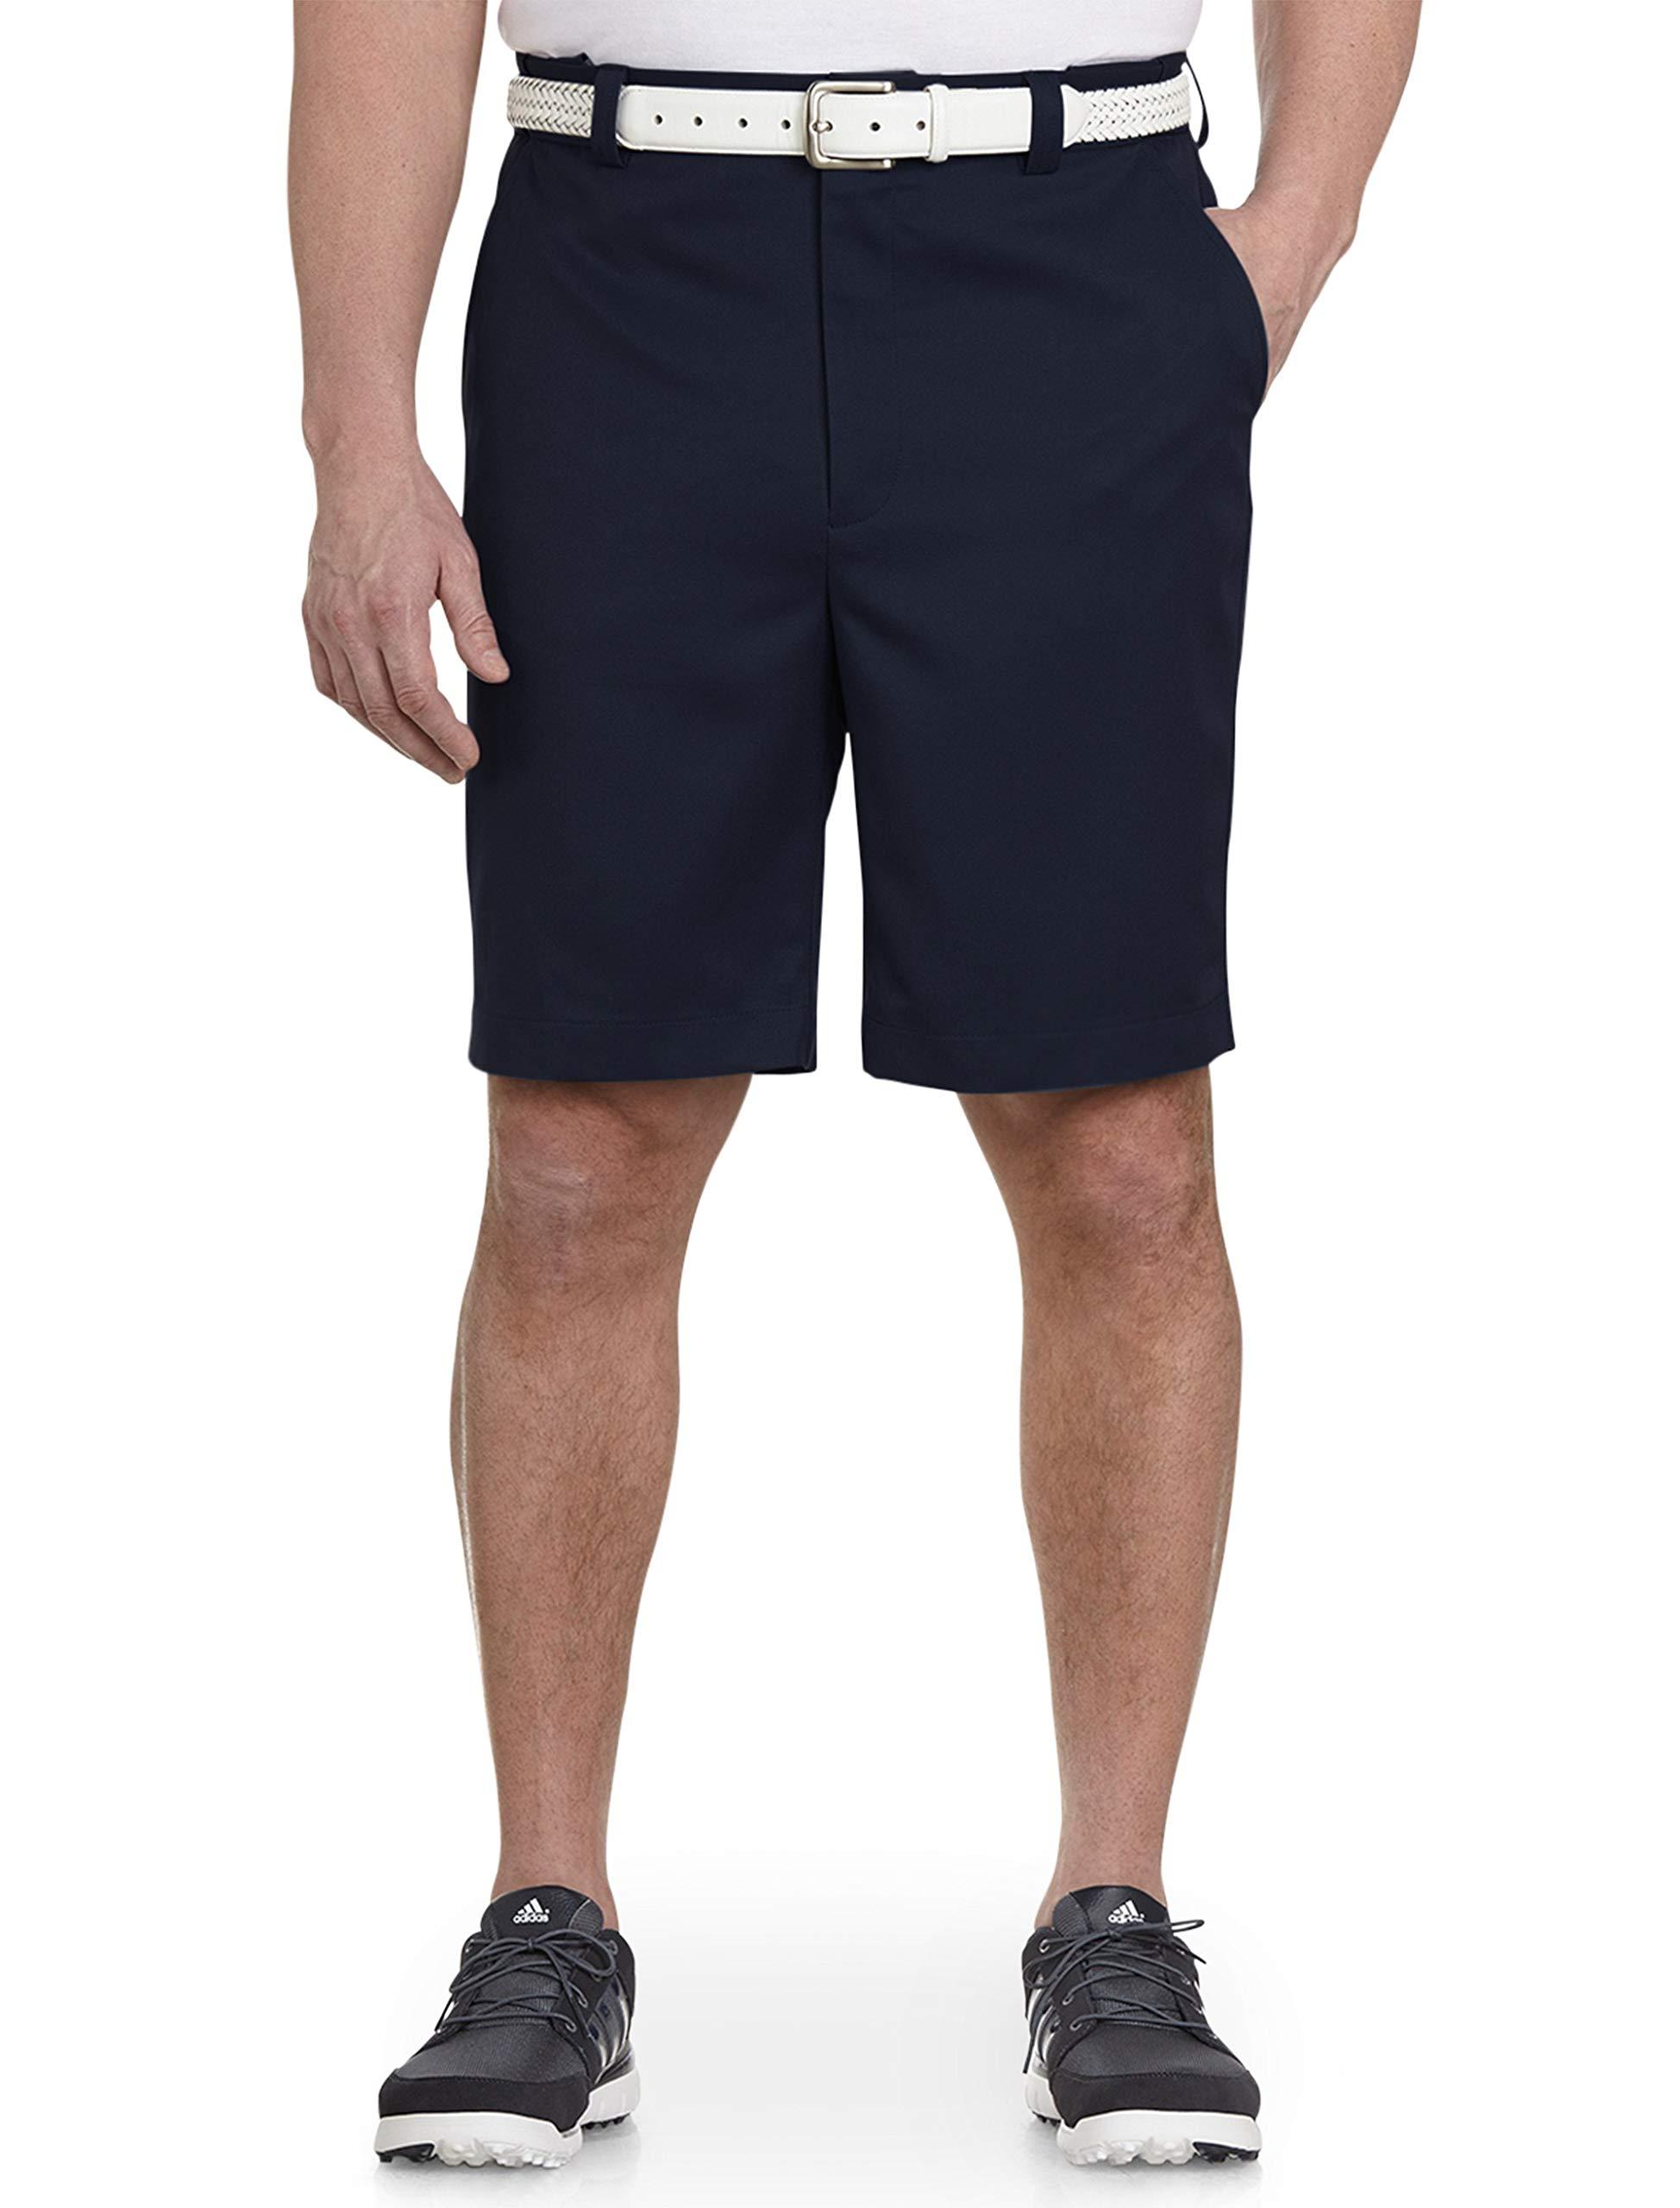 Oak Hill by DXL Big and Tall Flat-Front Waist Relaxer Microfiber Shorts